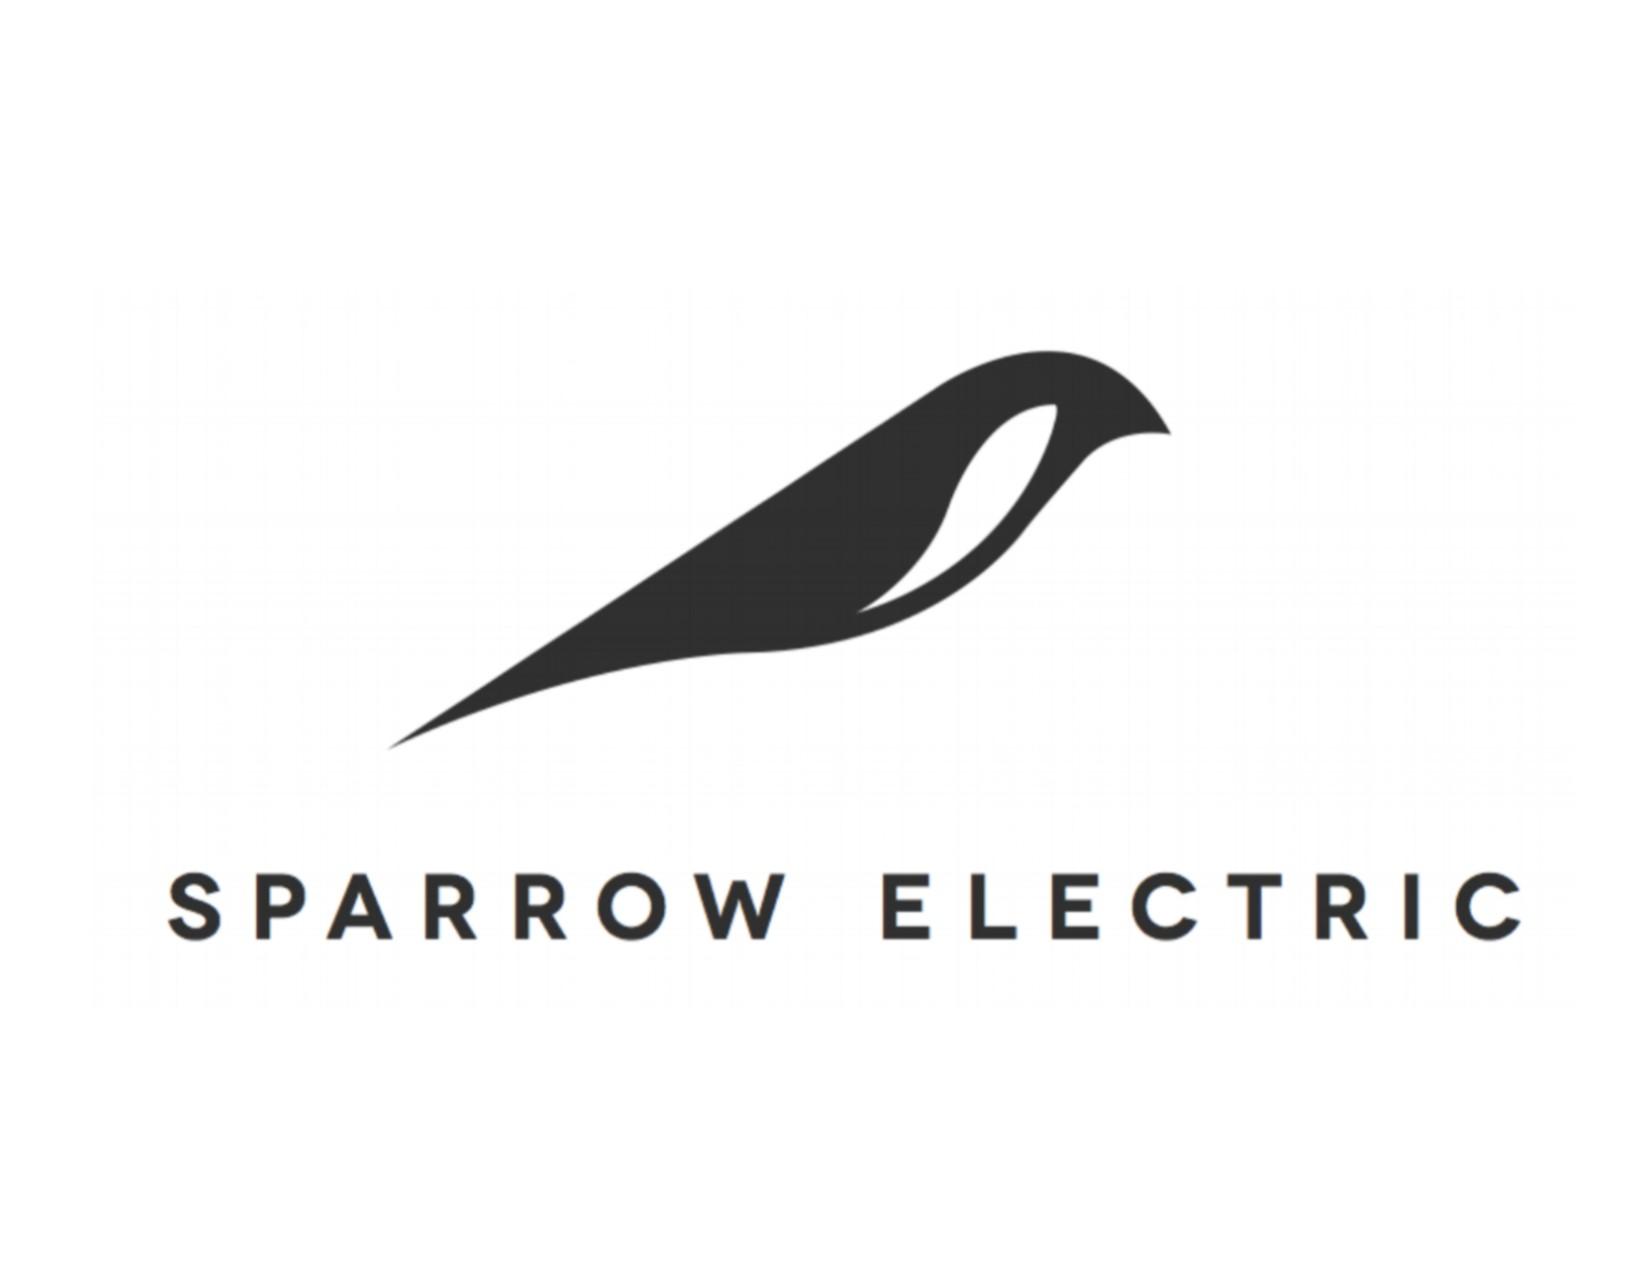 sparrow electric.jpg